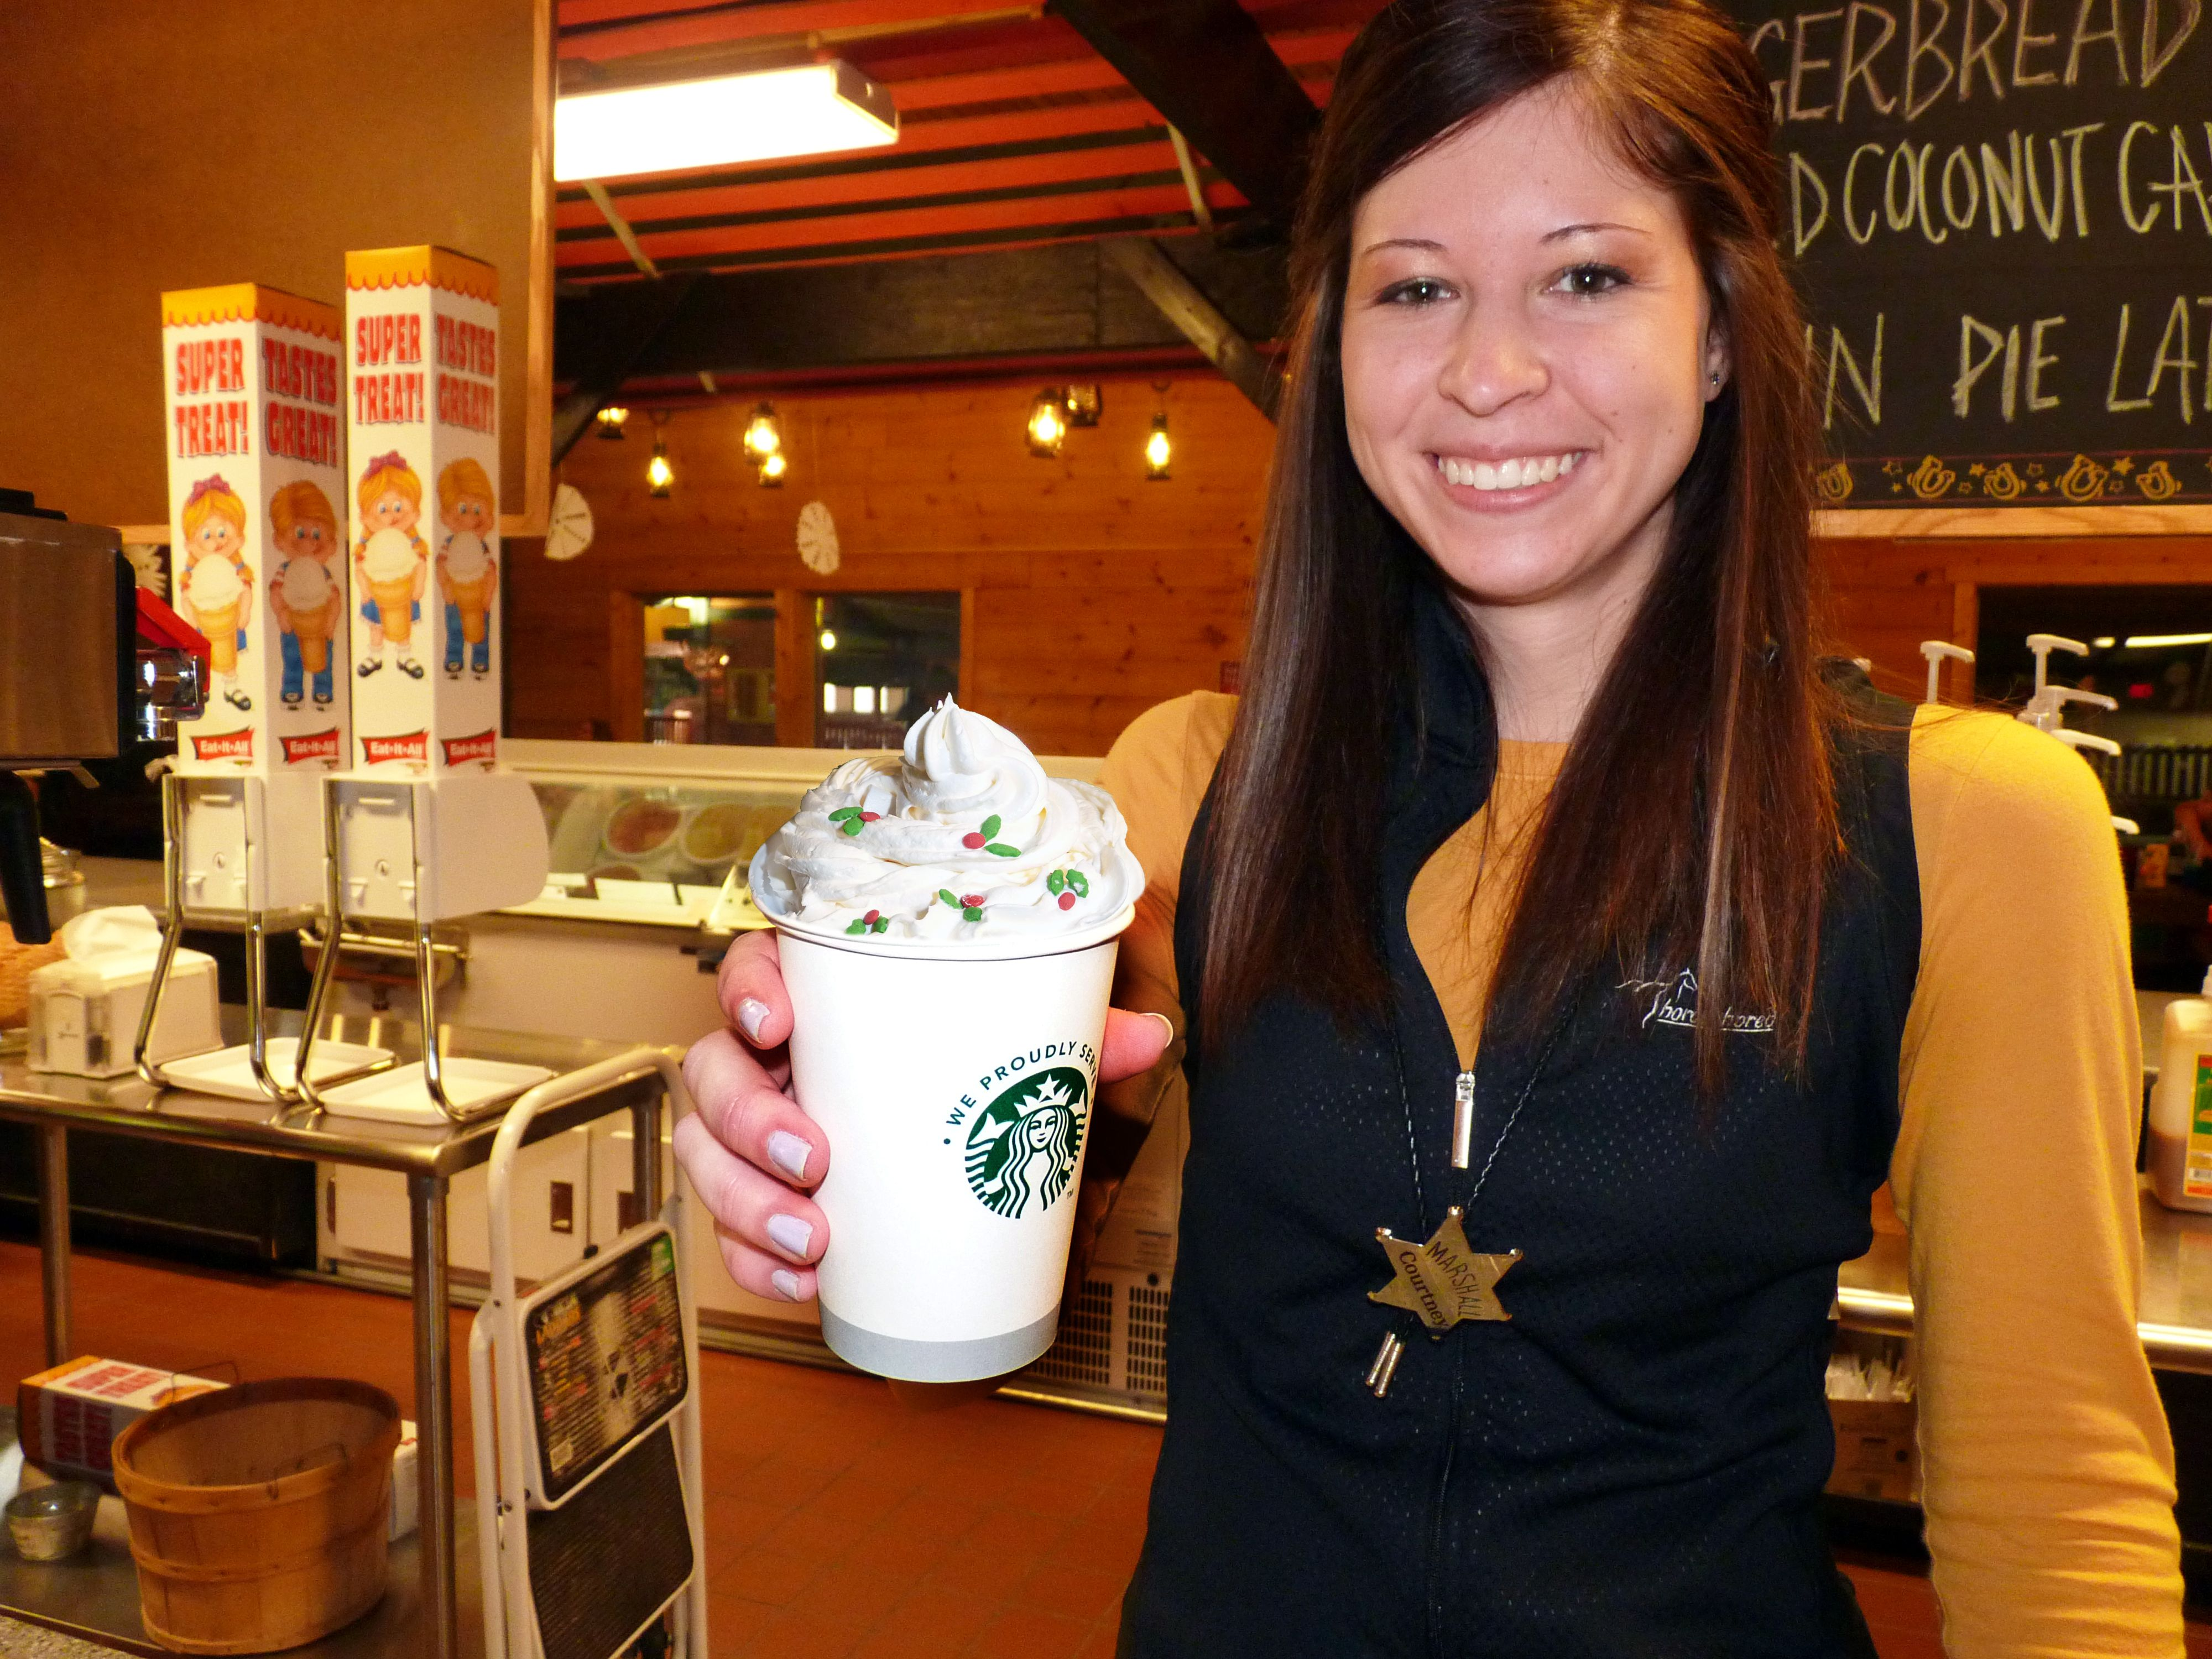 Enjoy Hot Starbucks at the Pony Expresso Winter fun